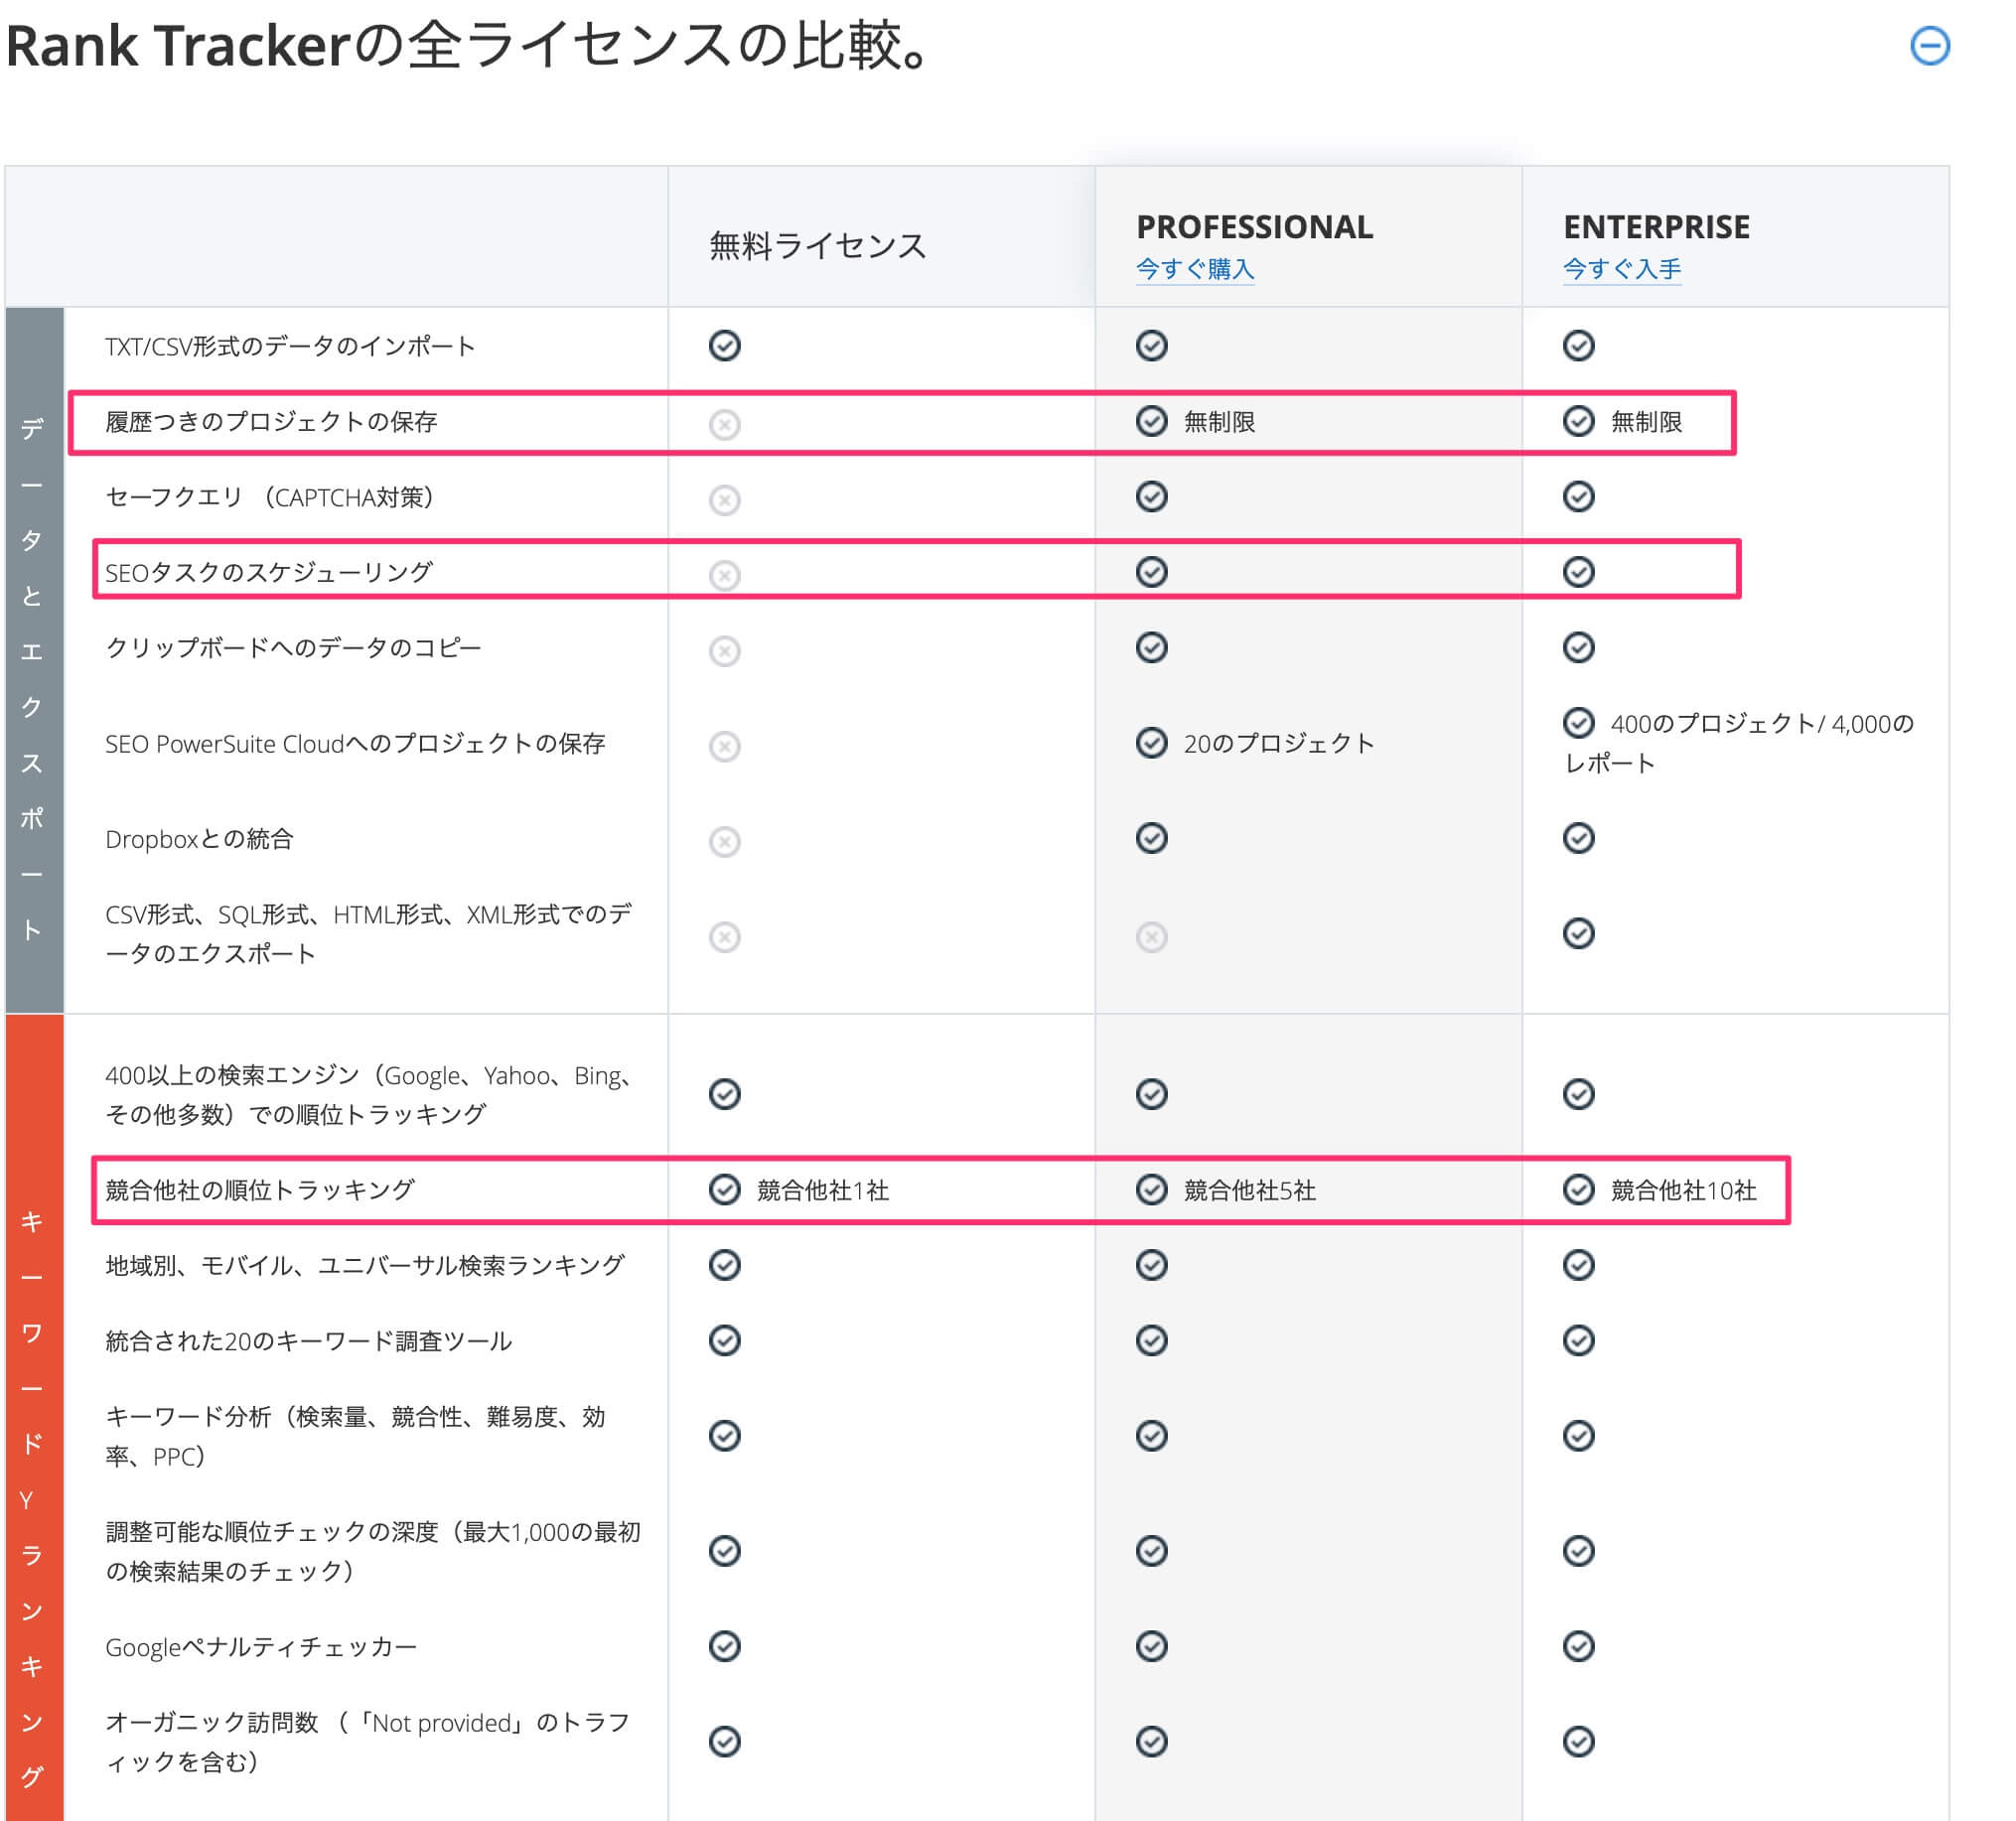 Rank Trackerの全ライセンスの比較